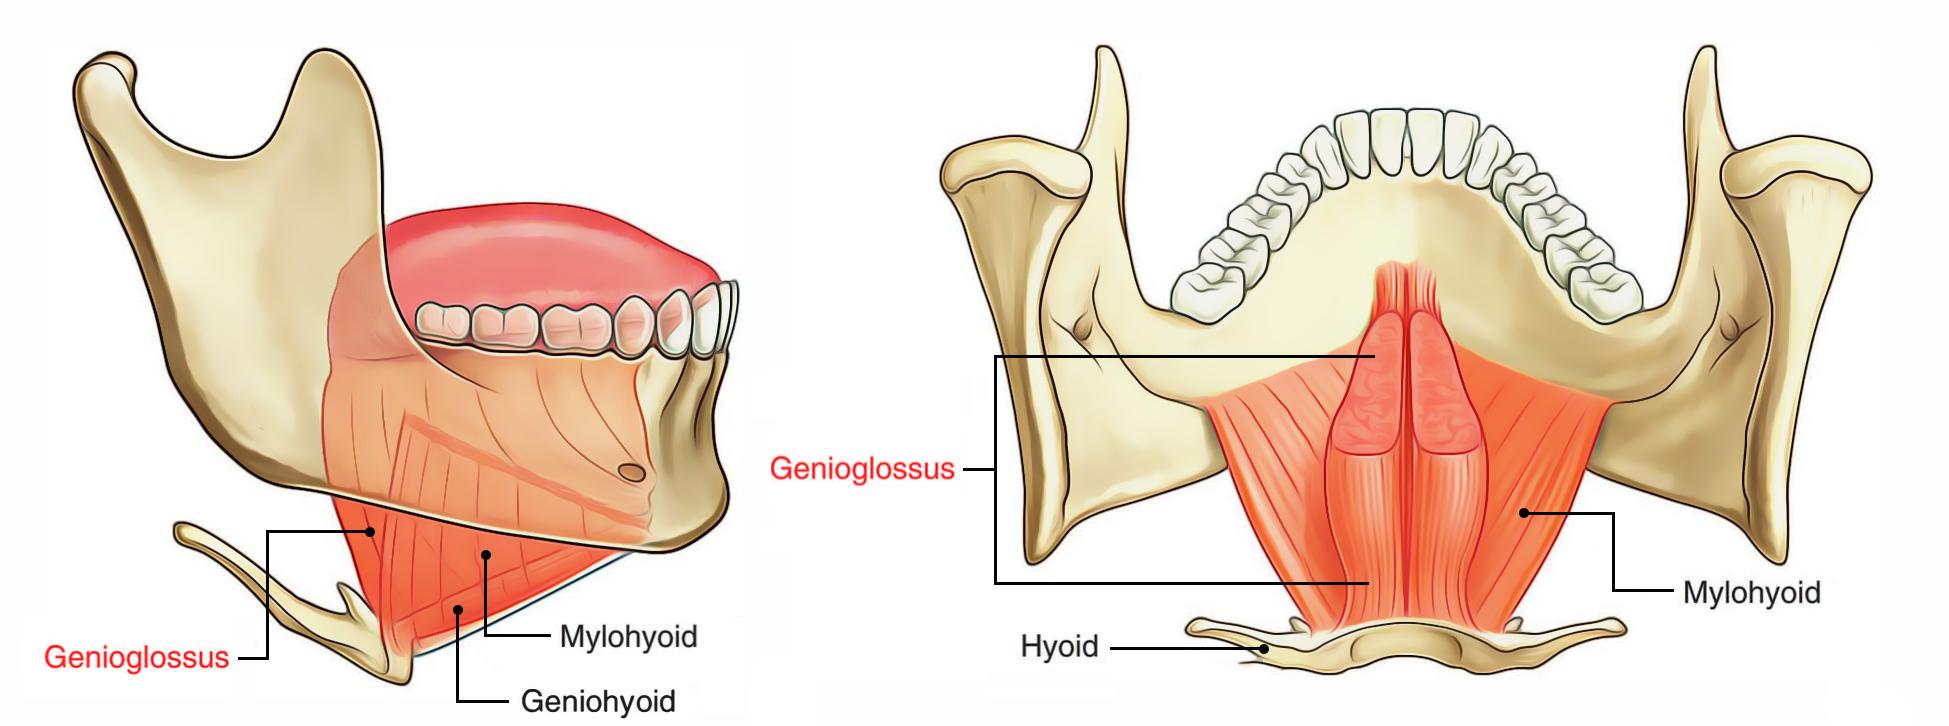 Base Of The Tongue Anatomy